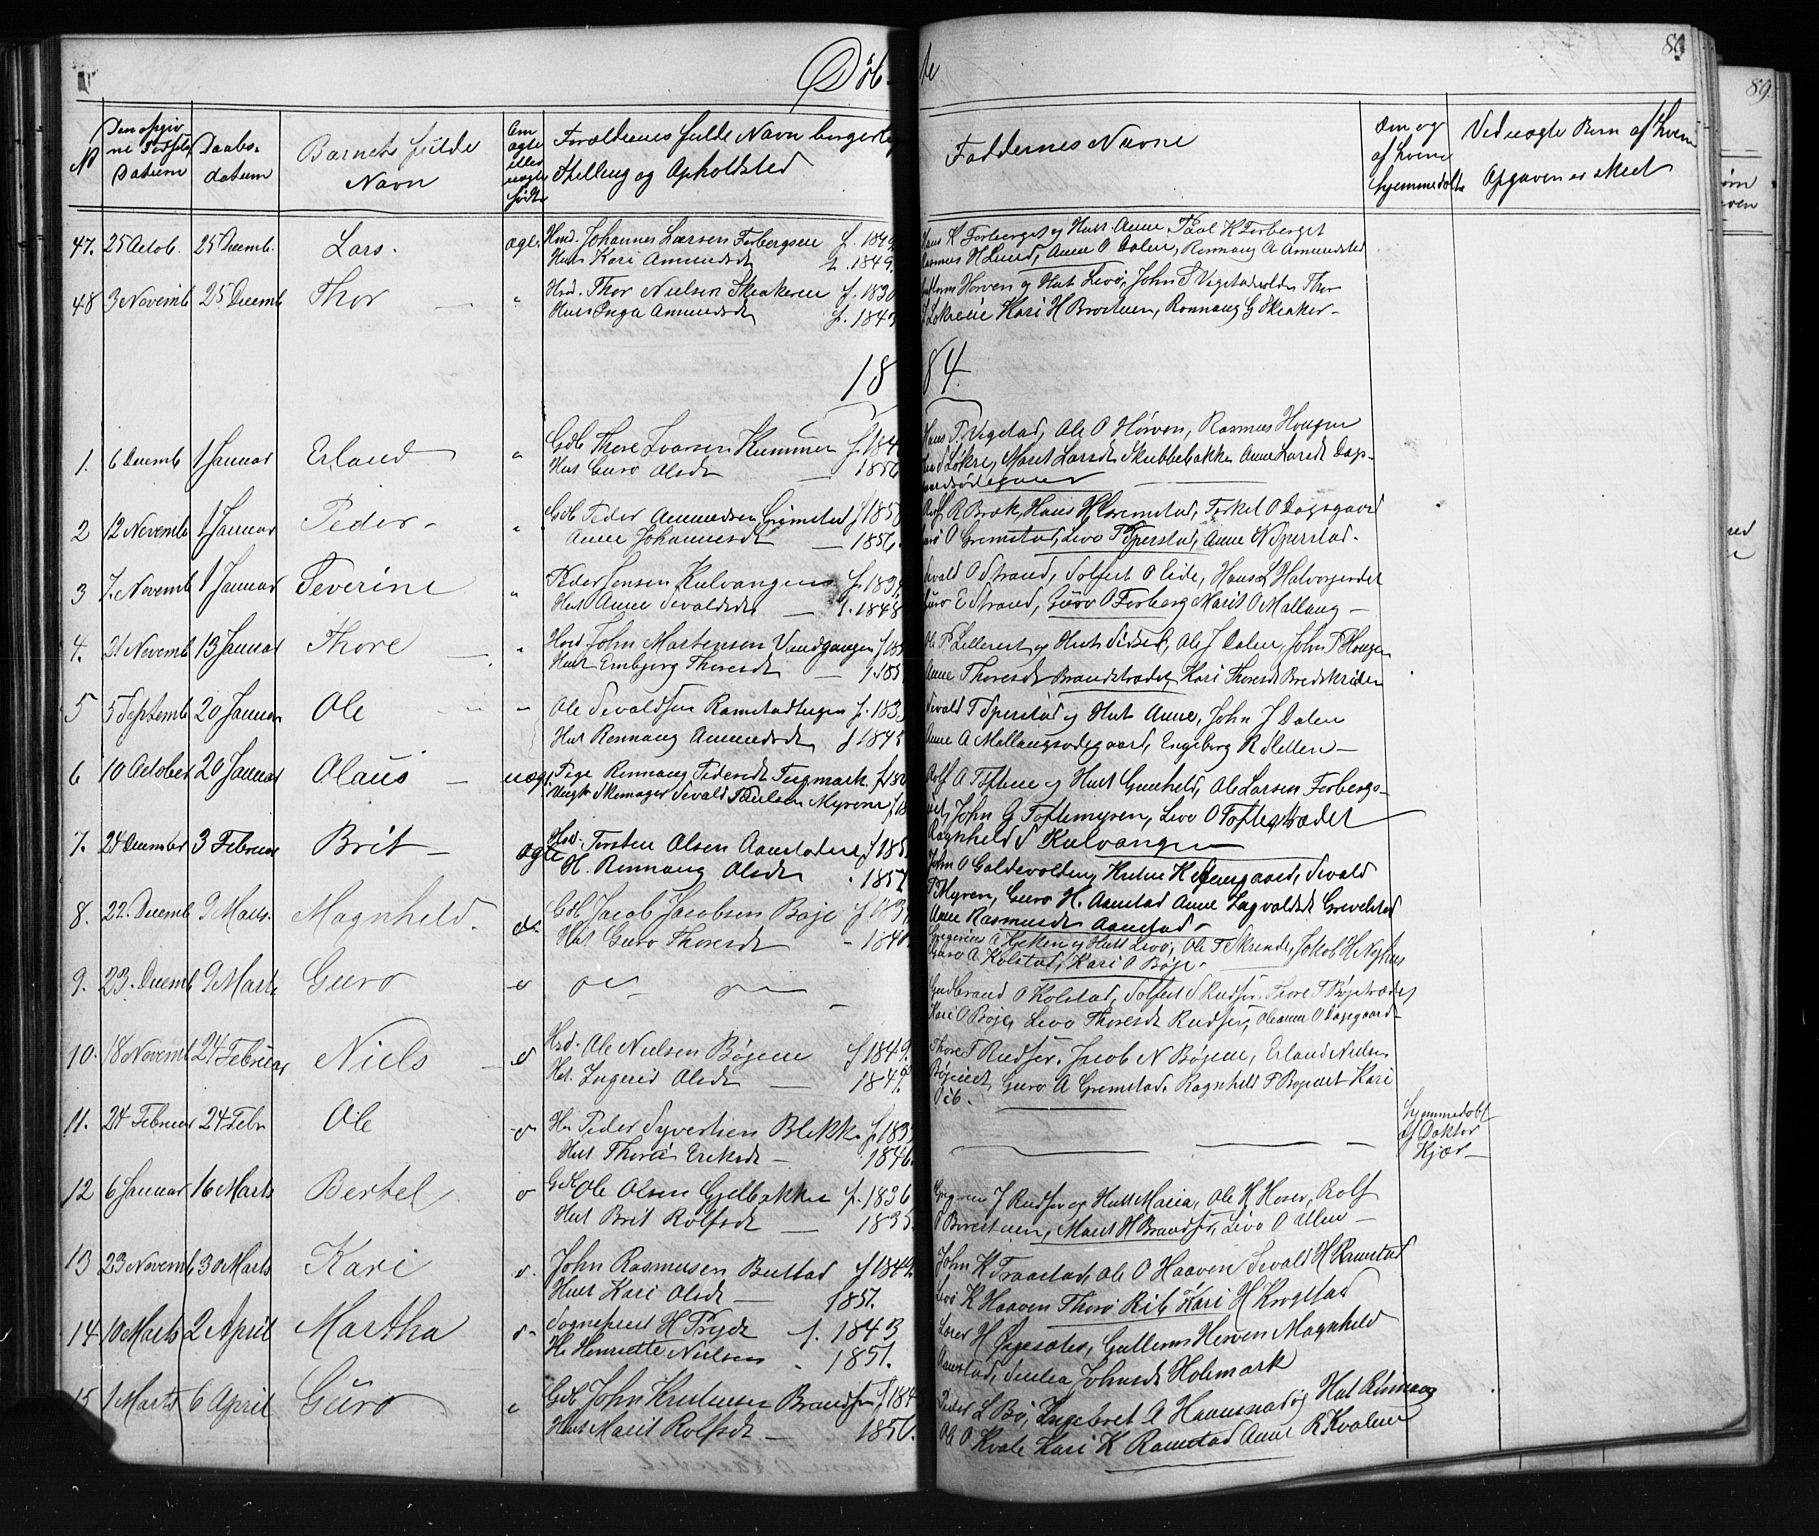 SAH, Skjåk prestekontor, Klokkerbok nr. 1, 1865-1893, s. 80